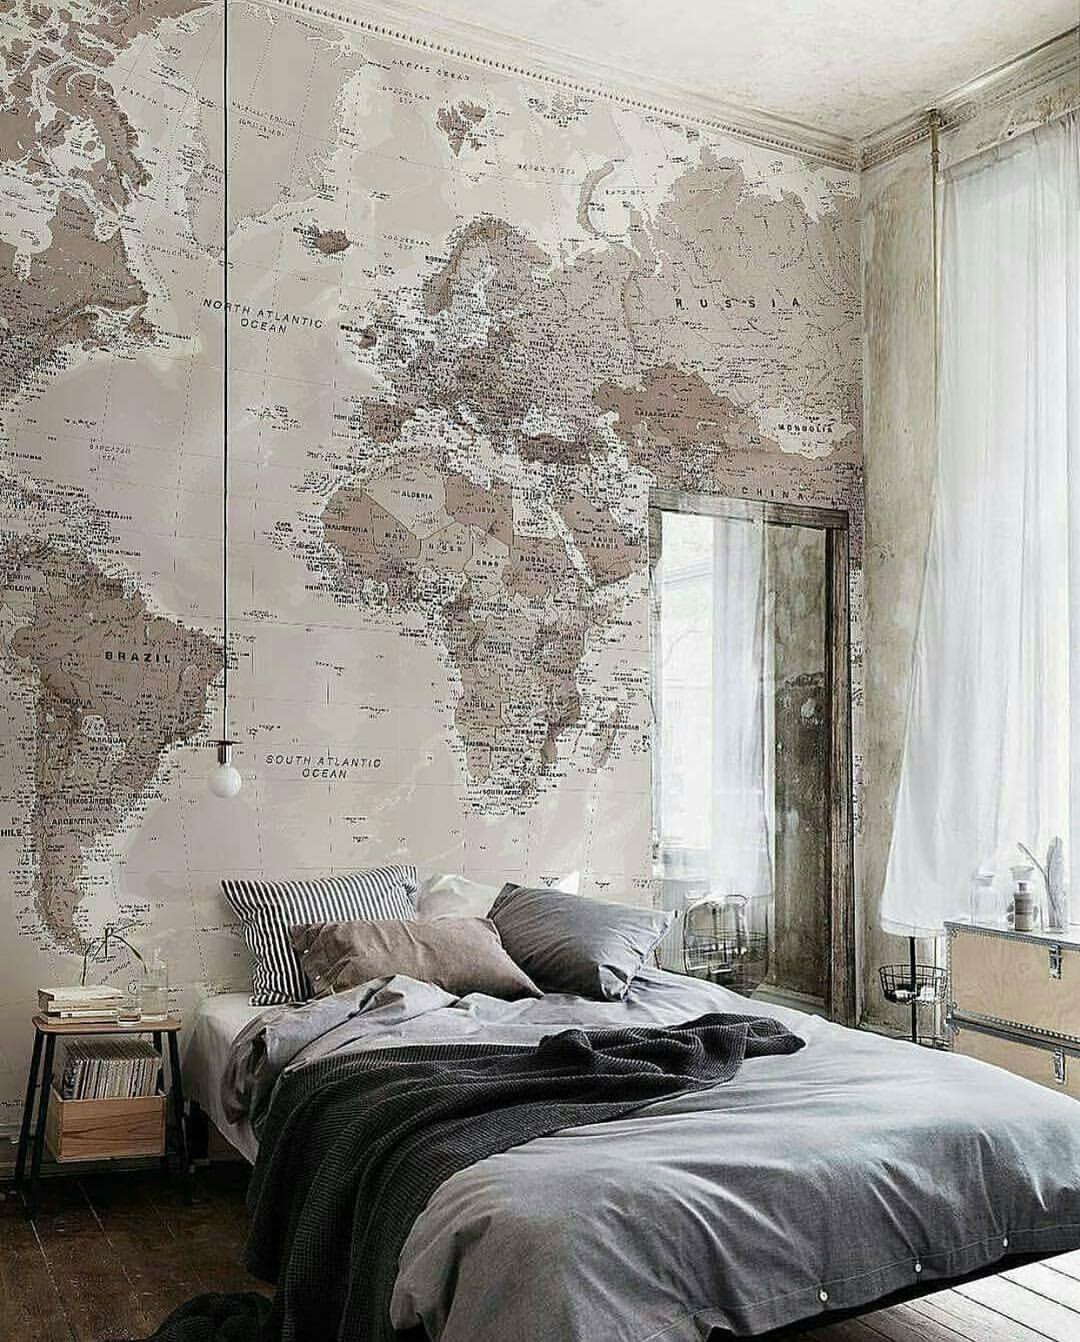 masculine bedroom mural wallpaper for the home pinterest maison deco et decoration. Black Bedroom Furniture Sets. Home Design Ideas